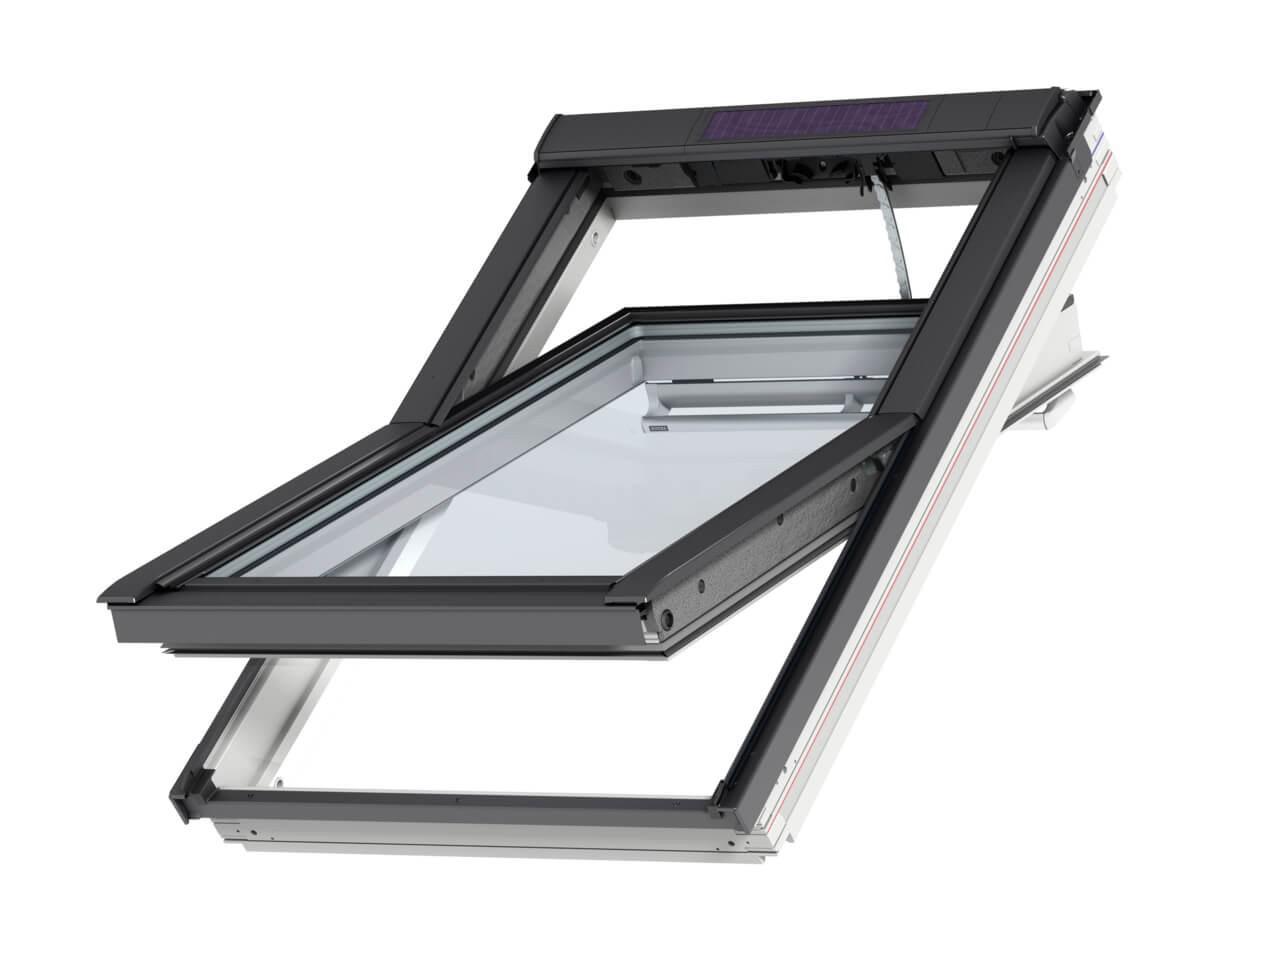 velux integra solar powered roof windows roofing megastore. Black Bedroom Furniture Sets. Home Design Ideas